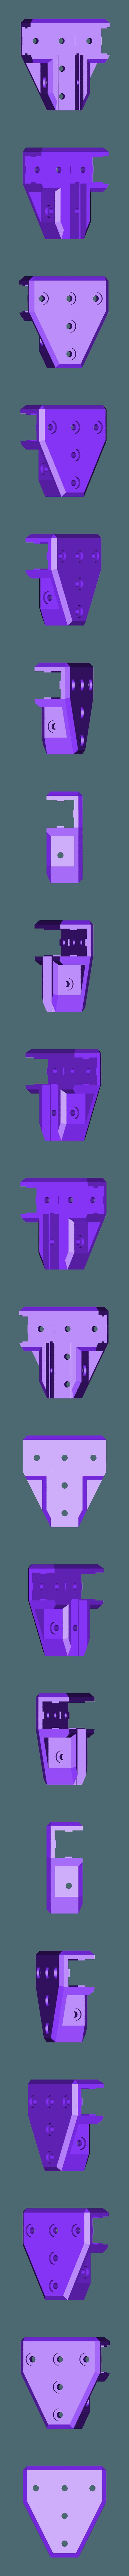 2020_T_Block_V2.stl Download free STL file 2020 Profile Aluminum 3D Printable Erector Set • 3D printer model, adamjvr